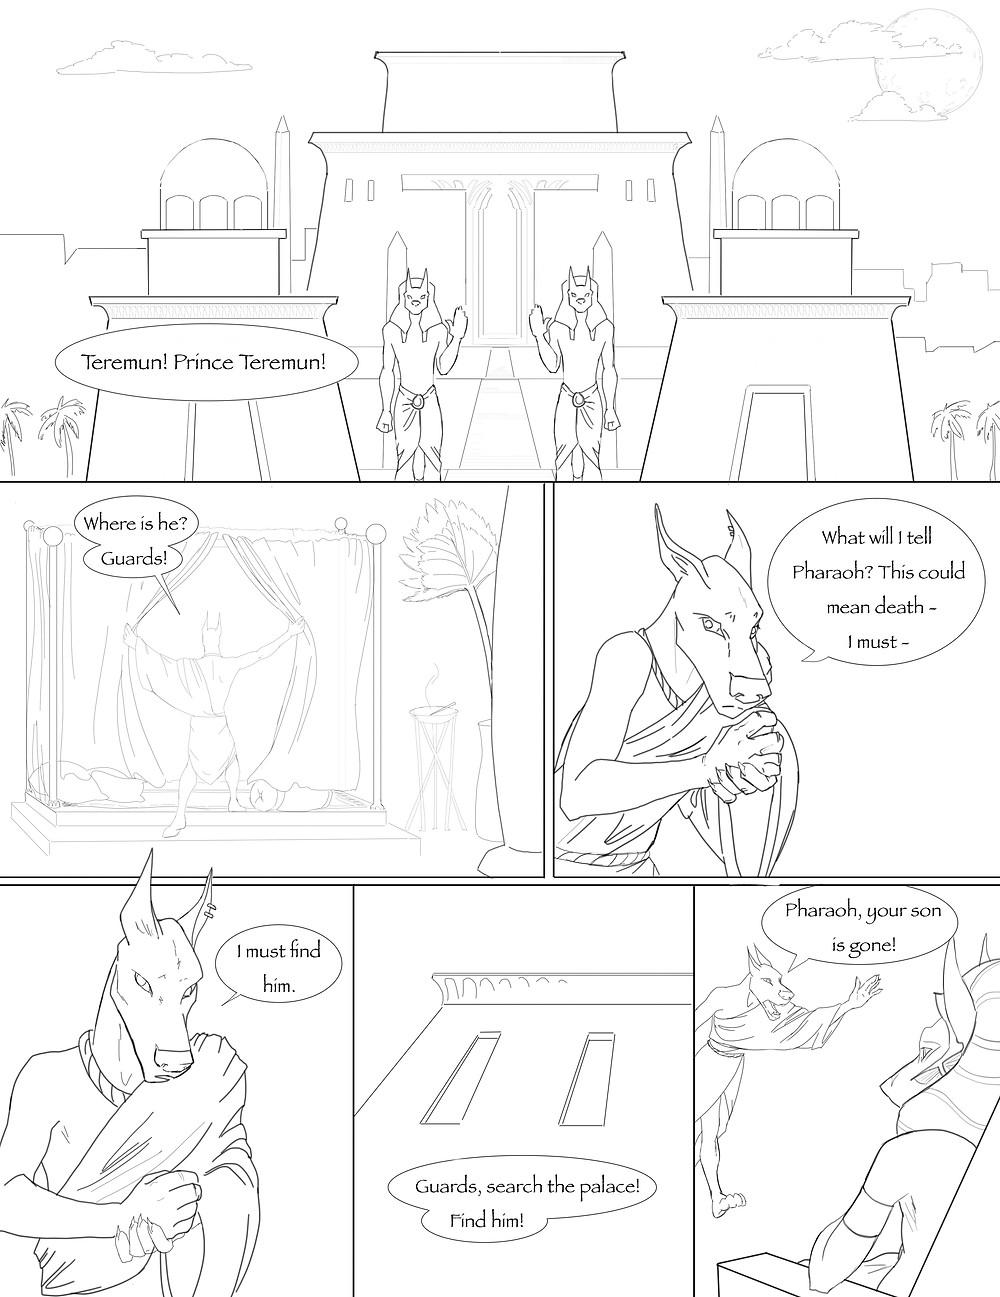 Anubis comic page 1